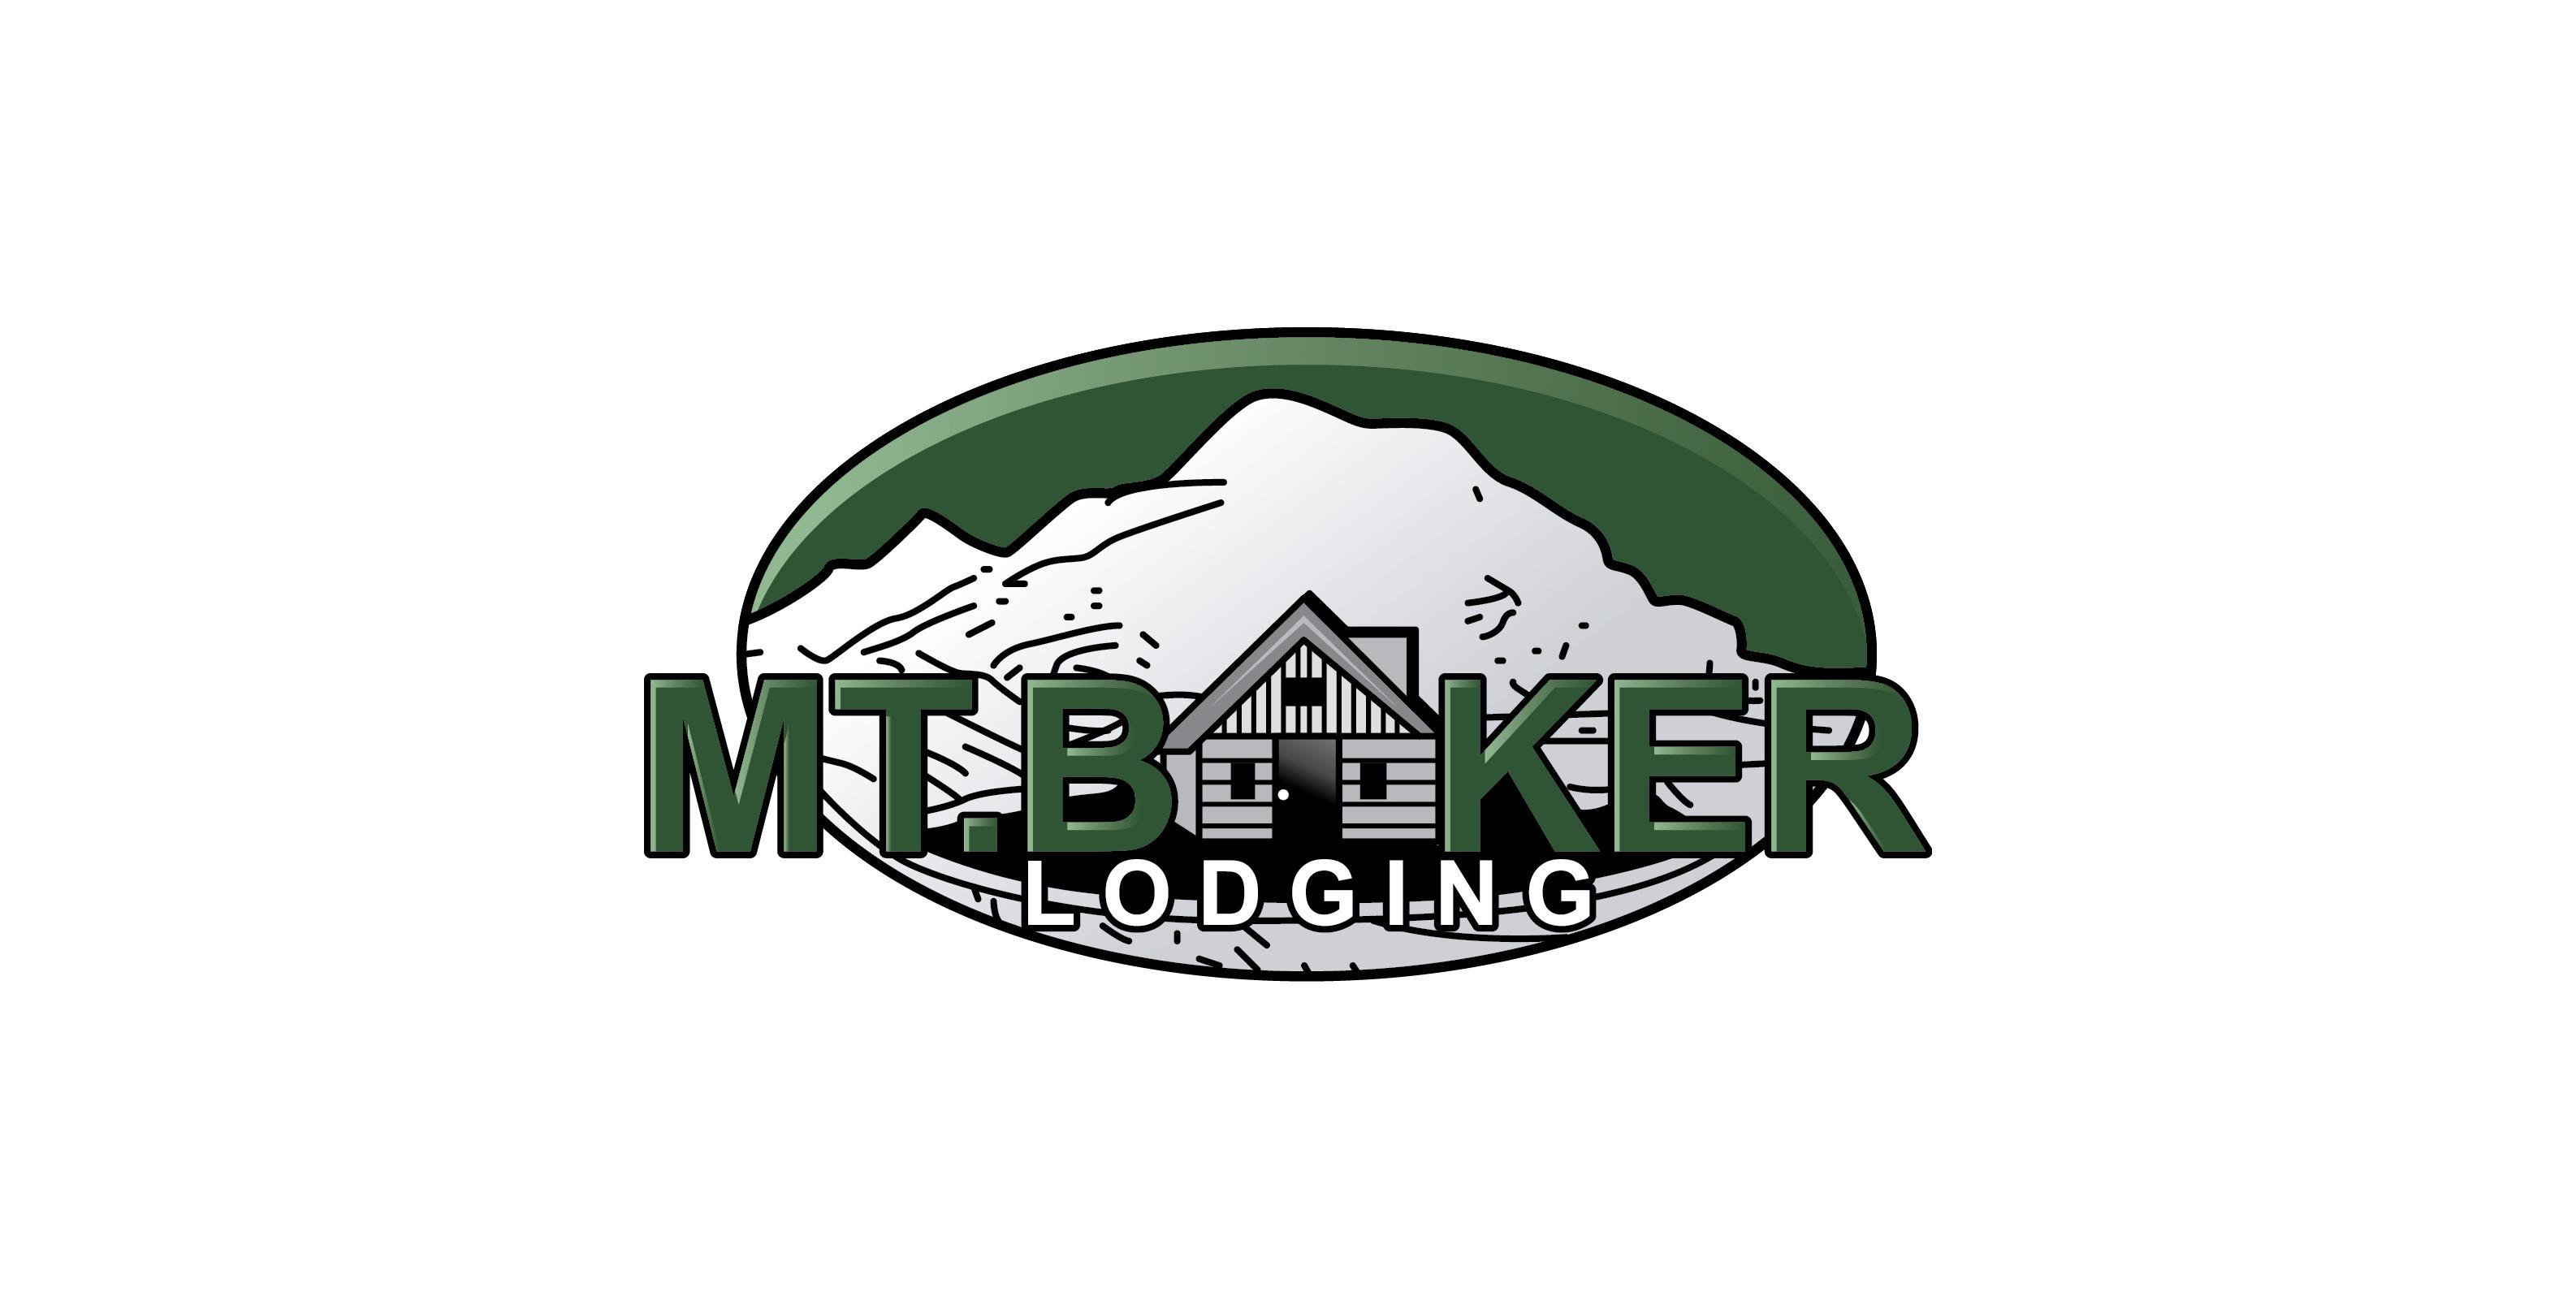 Apartment Mt  Baker Lodging Cabin  83  ndash  HOT TUB  LAKESIDE  DOCK  BBQ  W D  D W  SLEEPS-4  photo 31816859